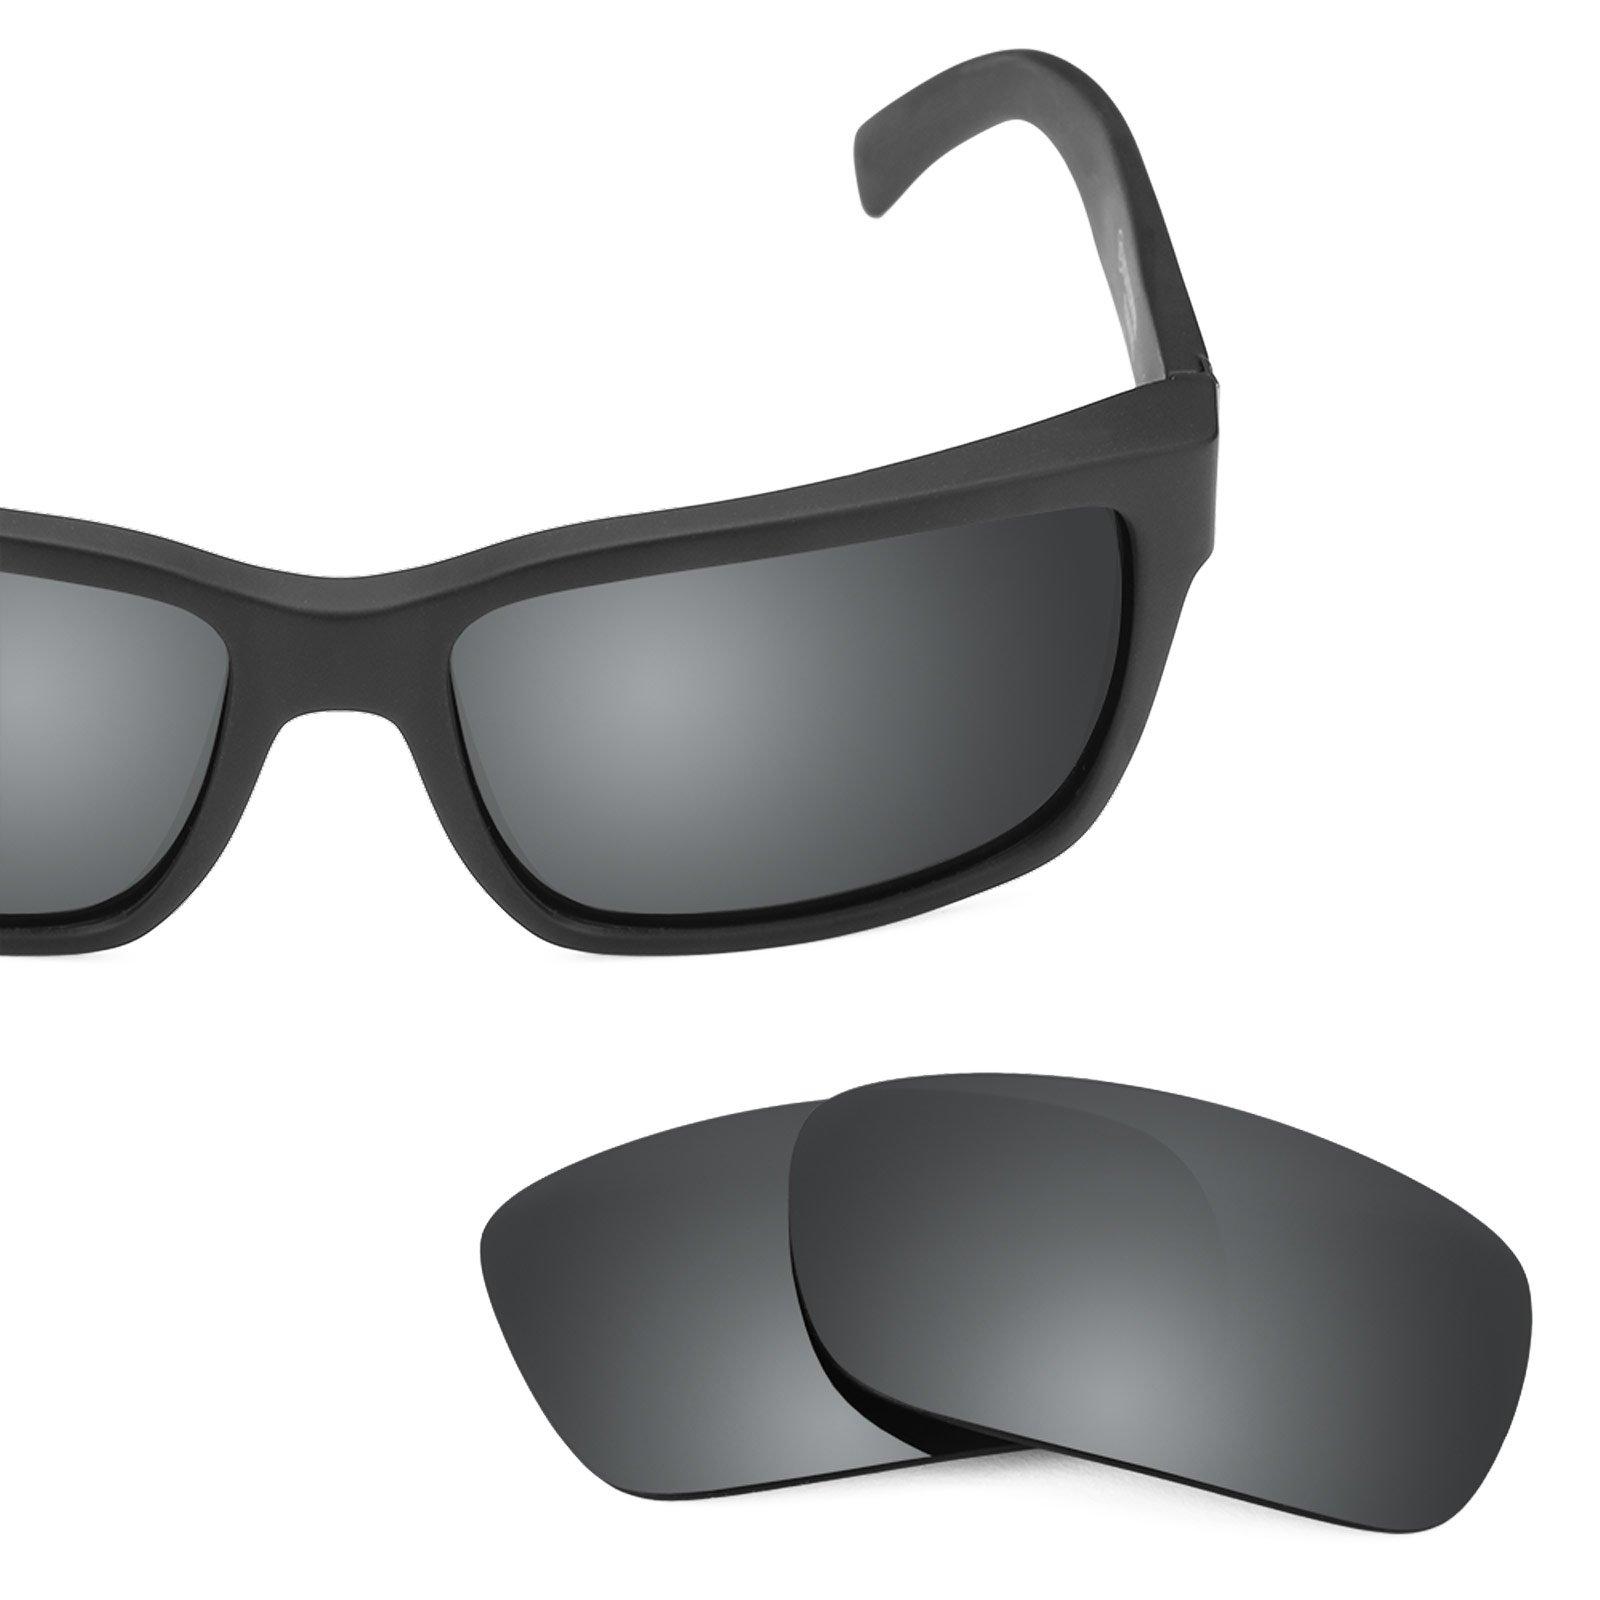 Revant Polarized Replacement Lenses for Von Zipper Elmore Black Chrome MirrorShield by Revant